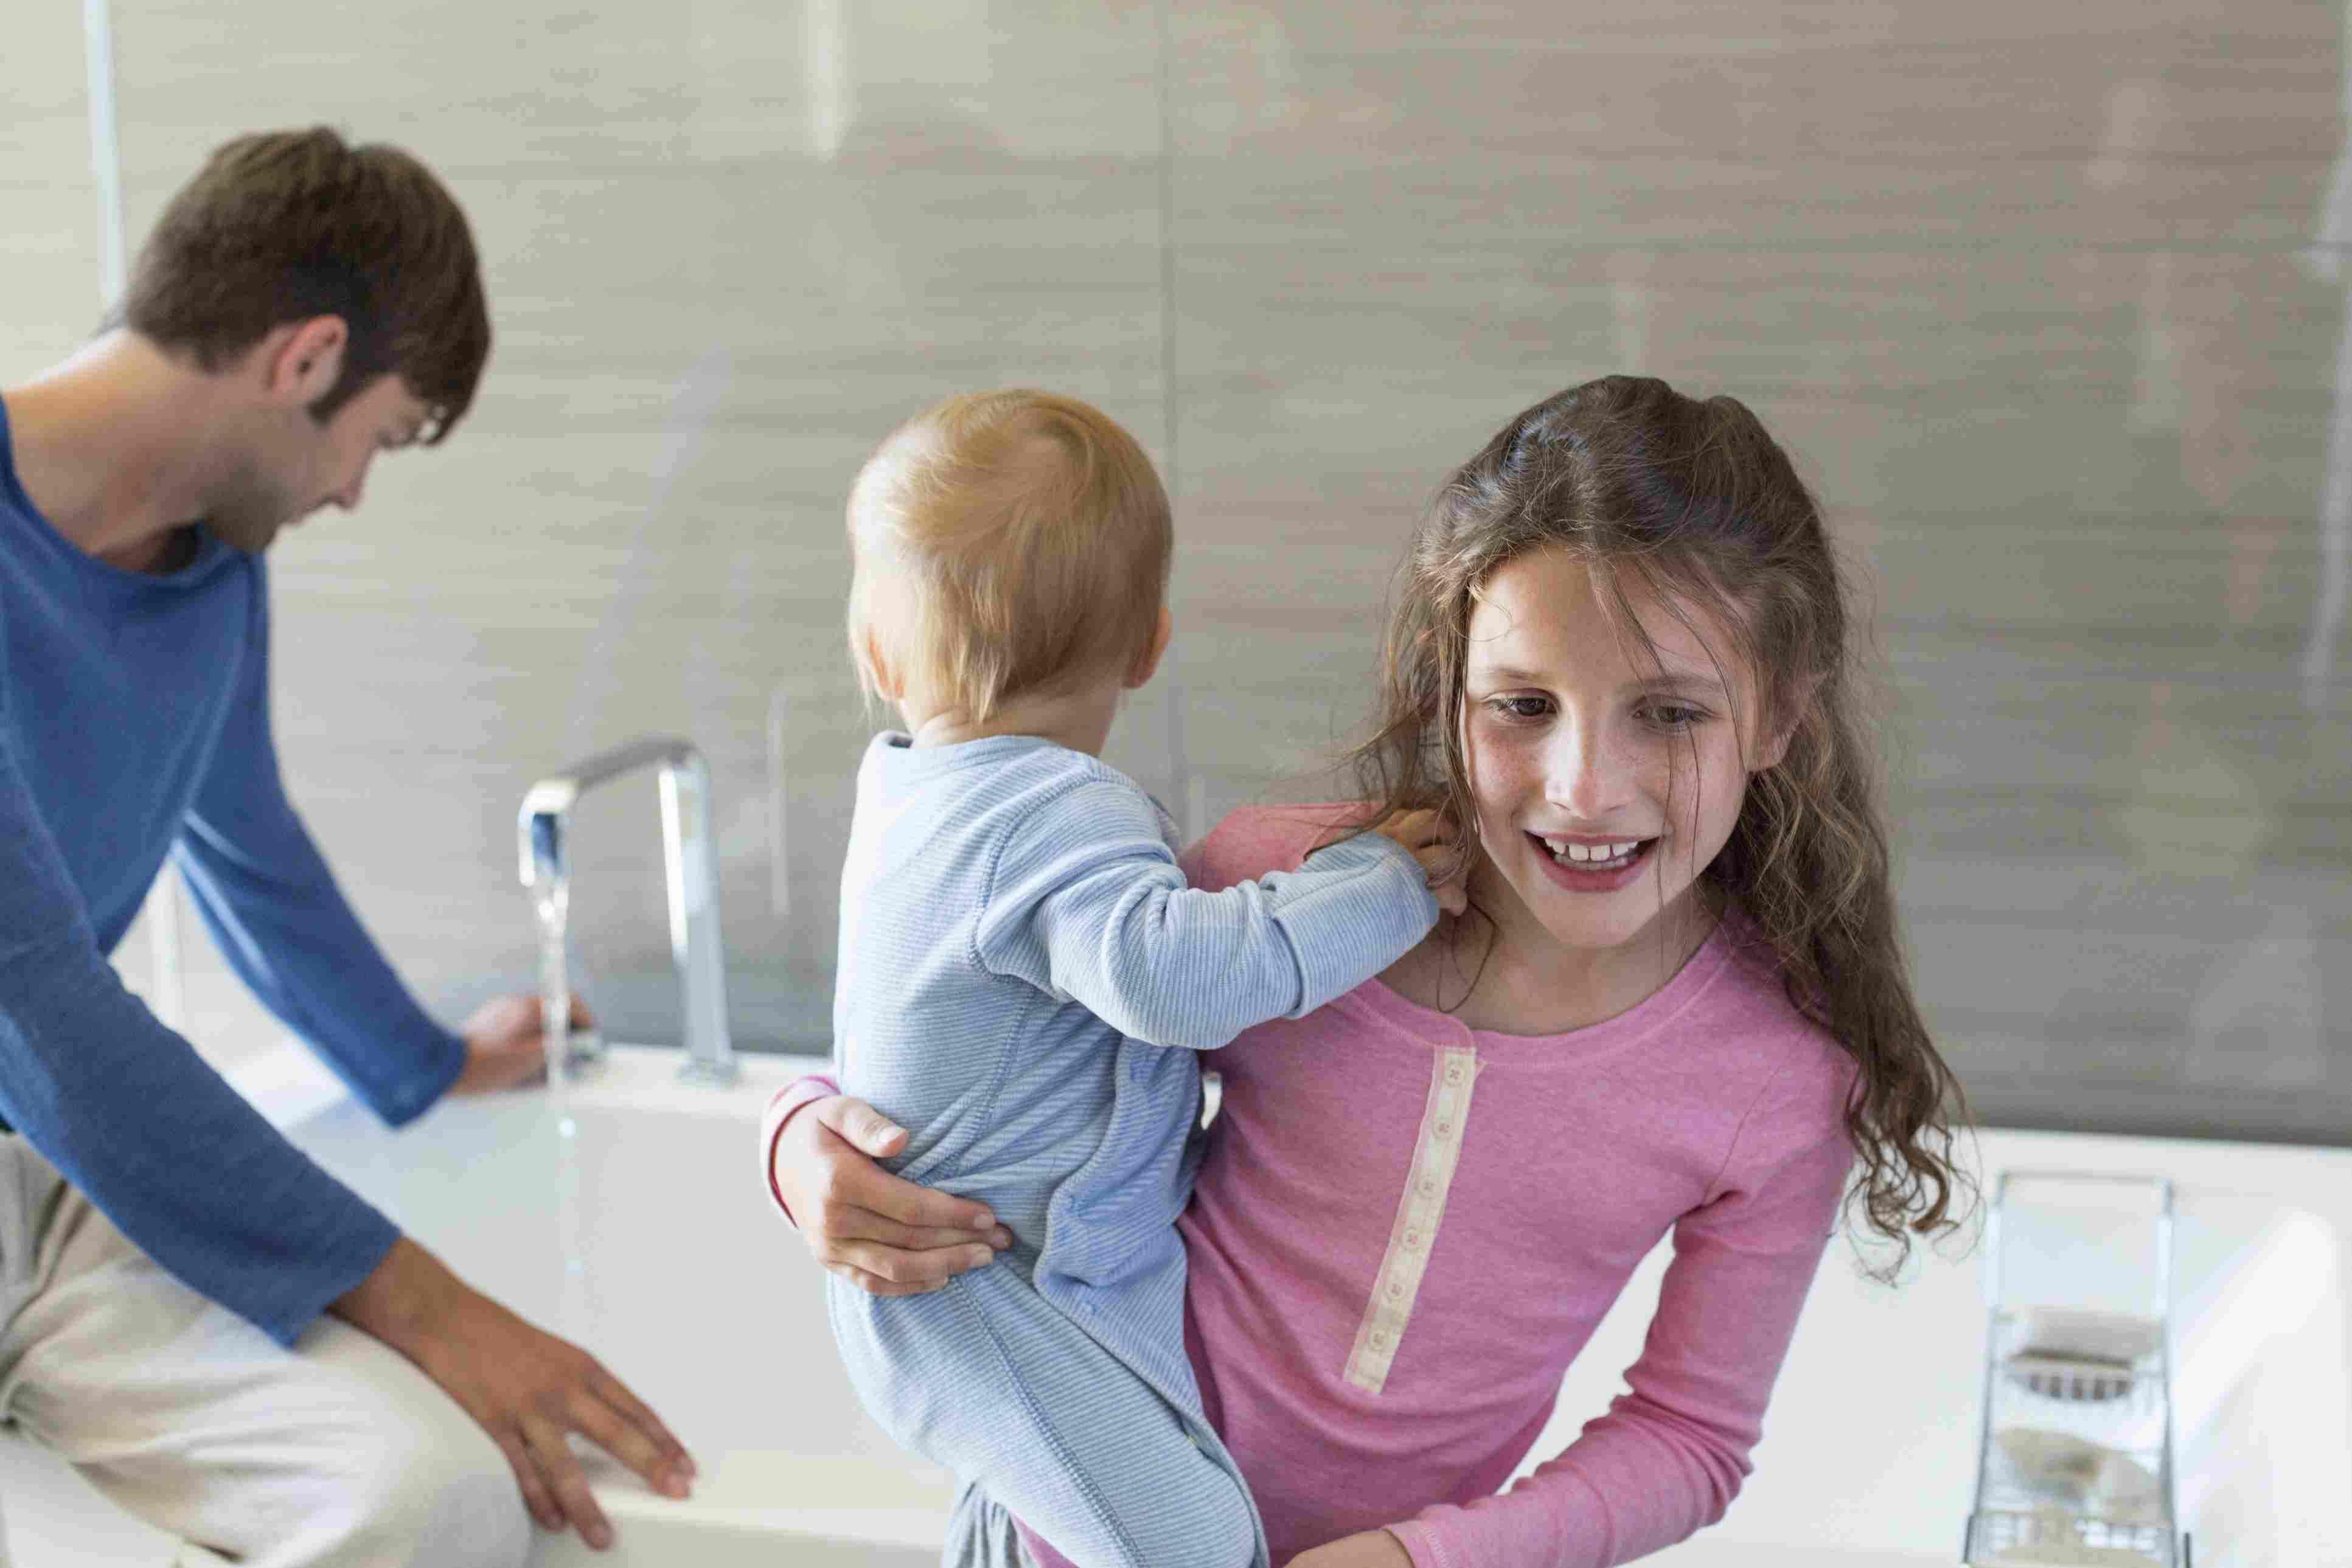 Developmental Milestones for Your 8 Year Old Child